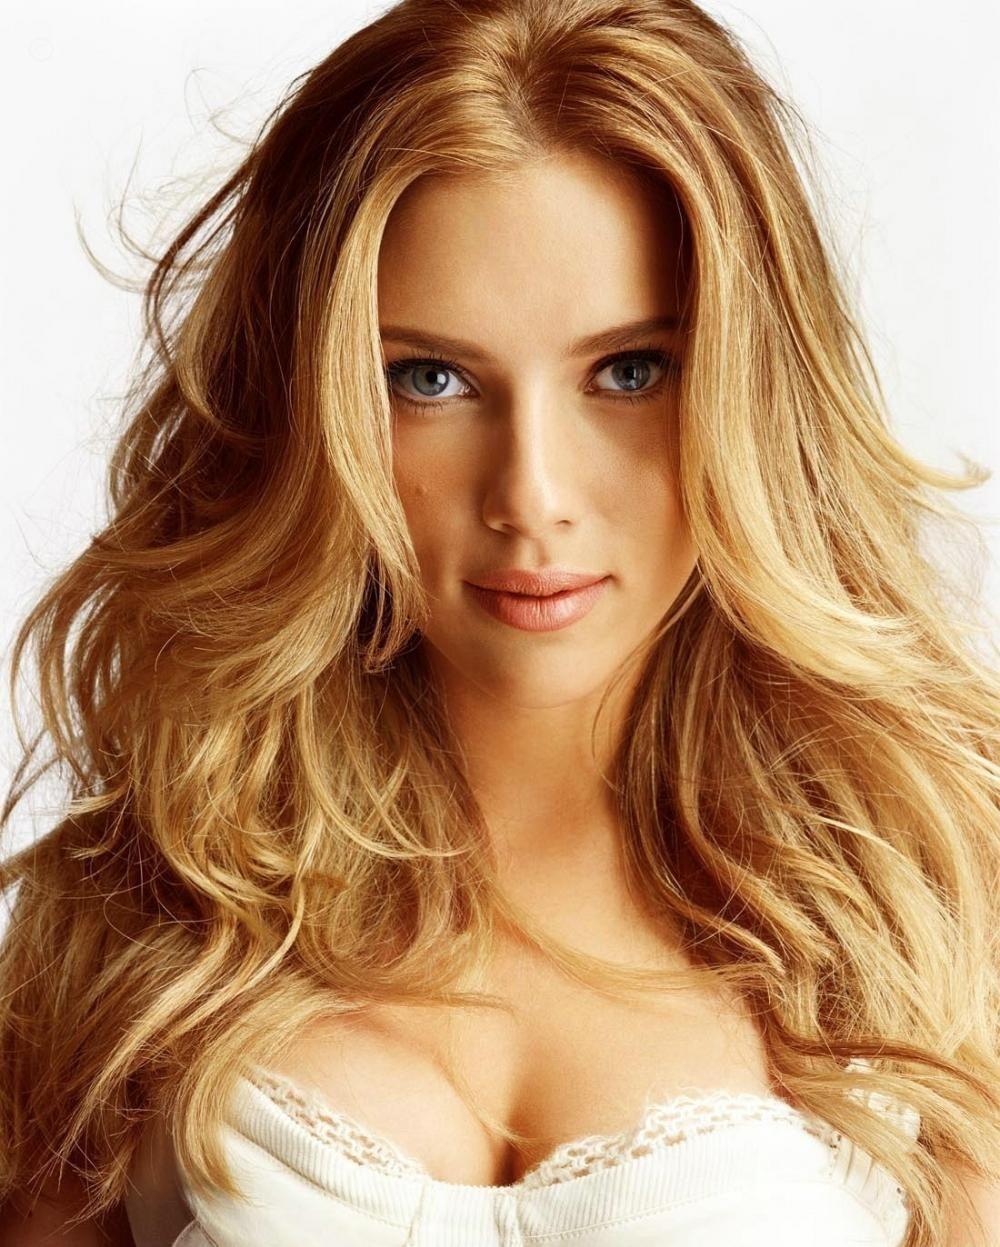 Scarlett Johansson Blonde Golden Hair Red Hair Photo Strawberry Blonde Hair Hair Styles Blonde Hair Color